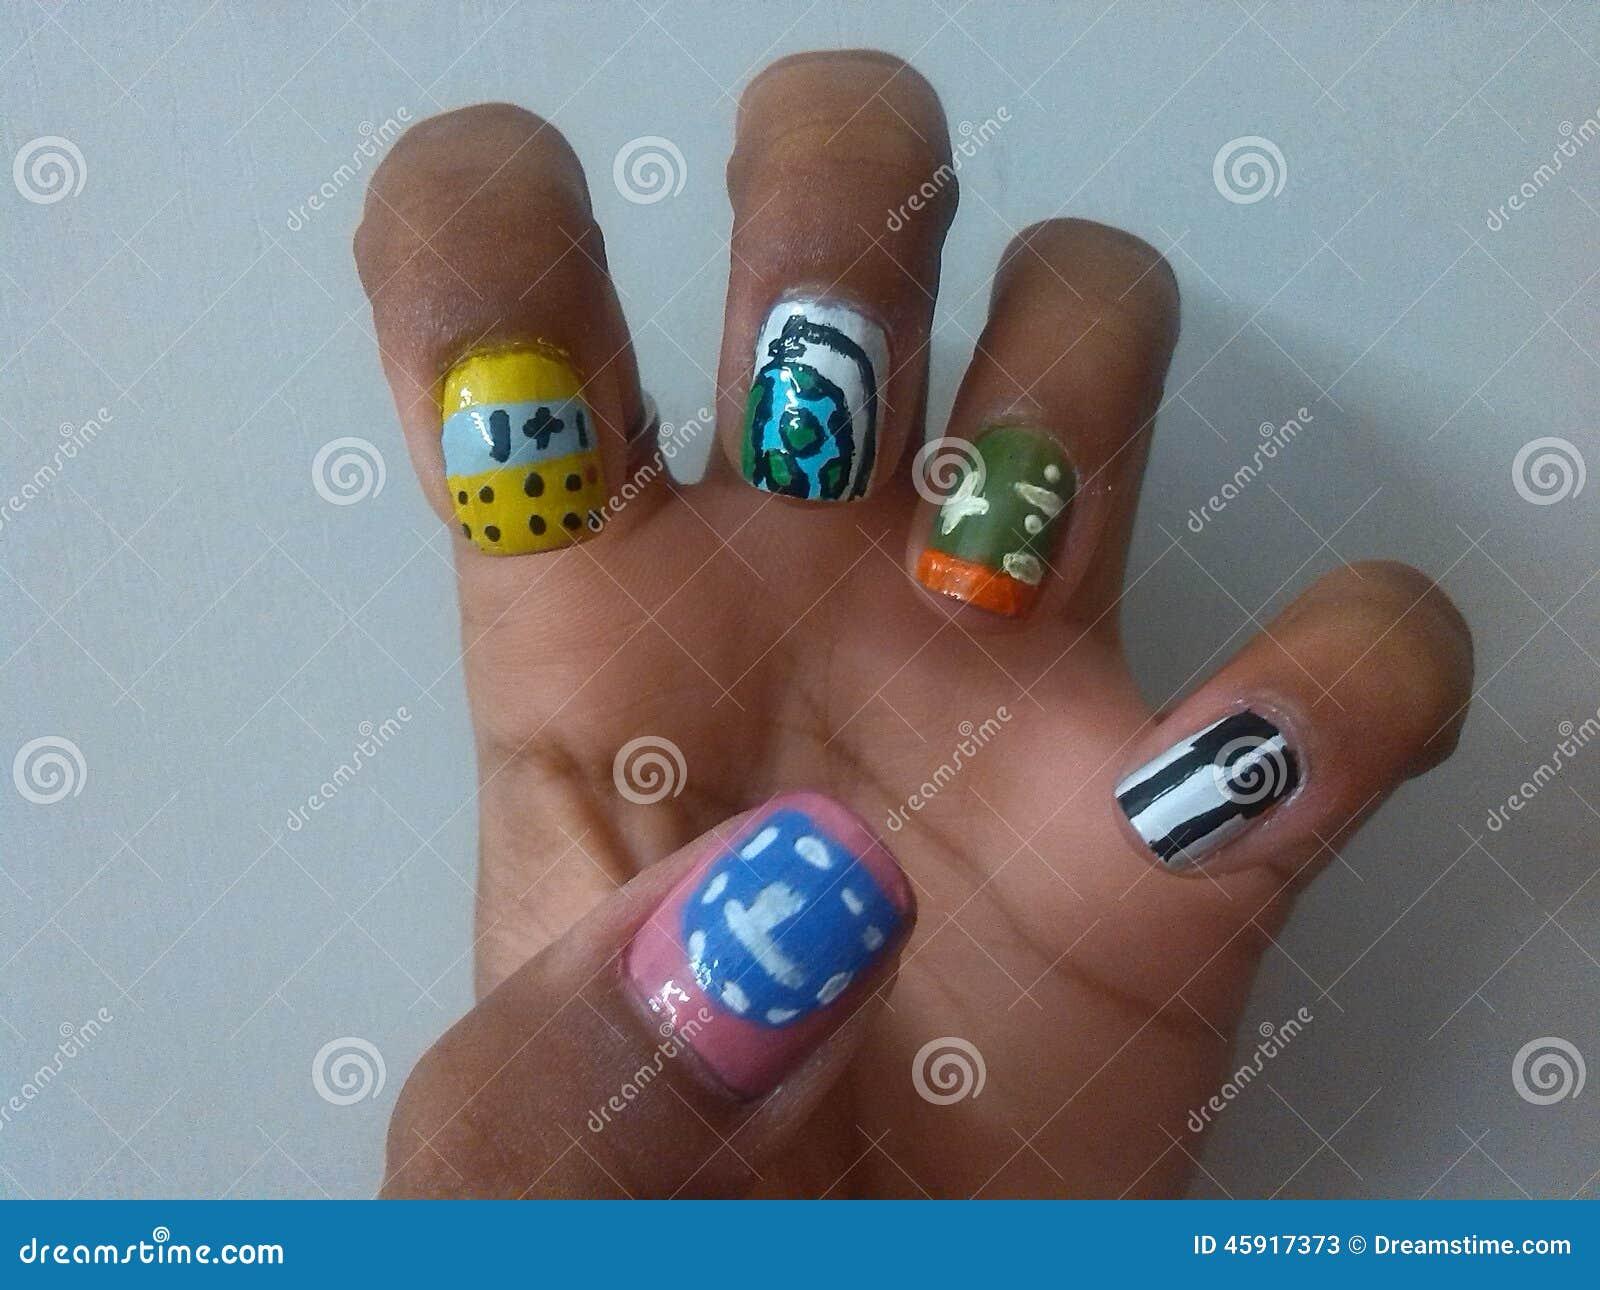 School nail art stock image. Image of music, school, math - 45917373